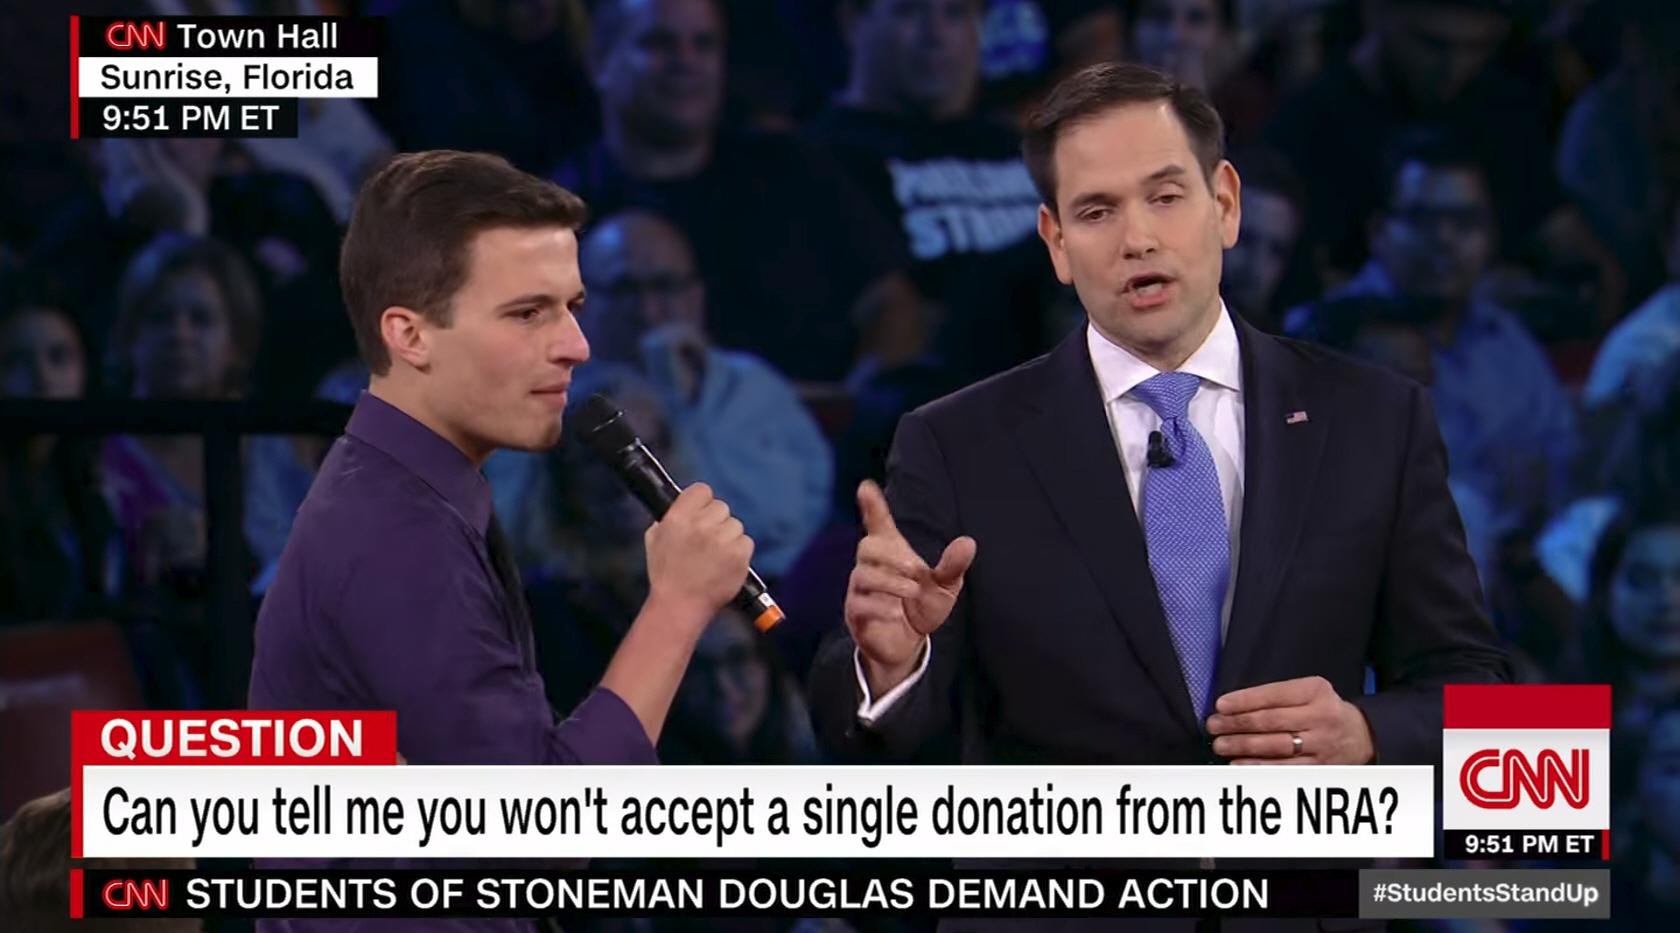 Marco Rubio during an appearance on CNN.